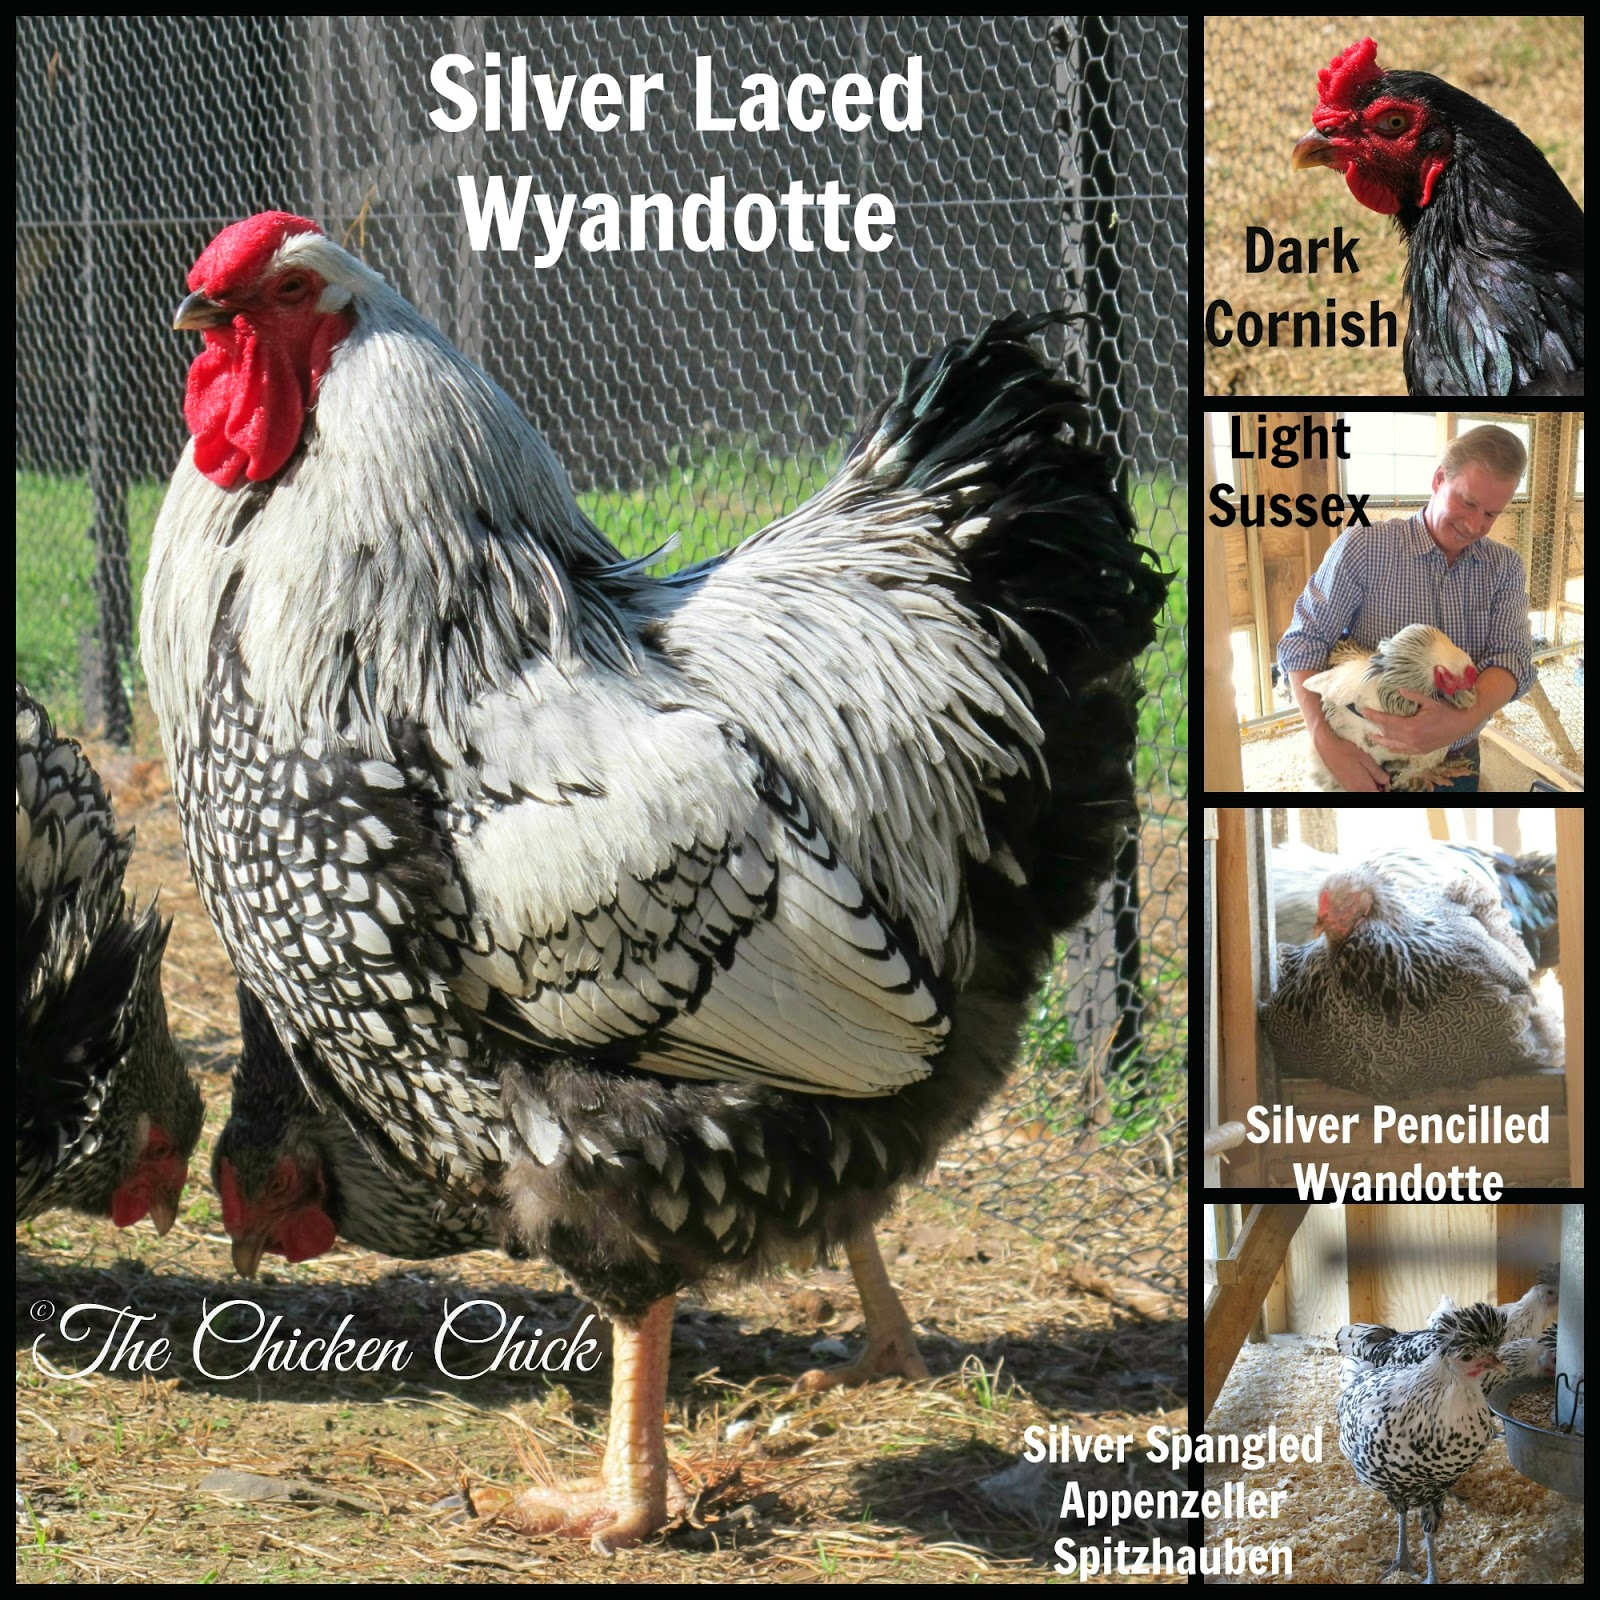 Silver Laced Wyandotte, Dark Cornish, Light Sussex and Silver Spangled Appenzeller Spitzhauben chickens P Allen Smith's Moss Mountain Farm